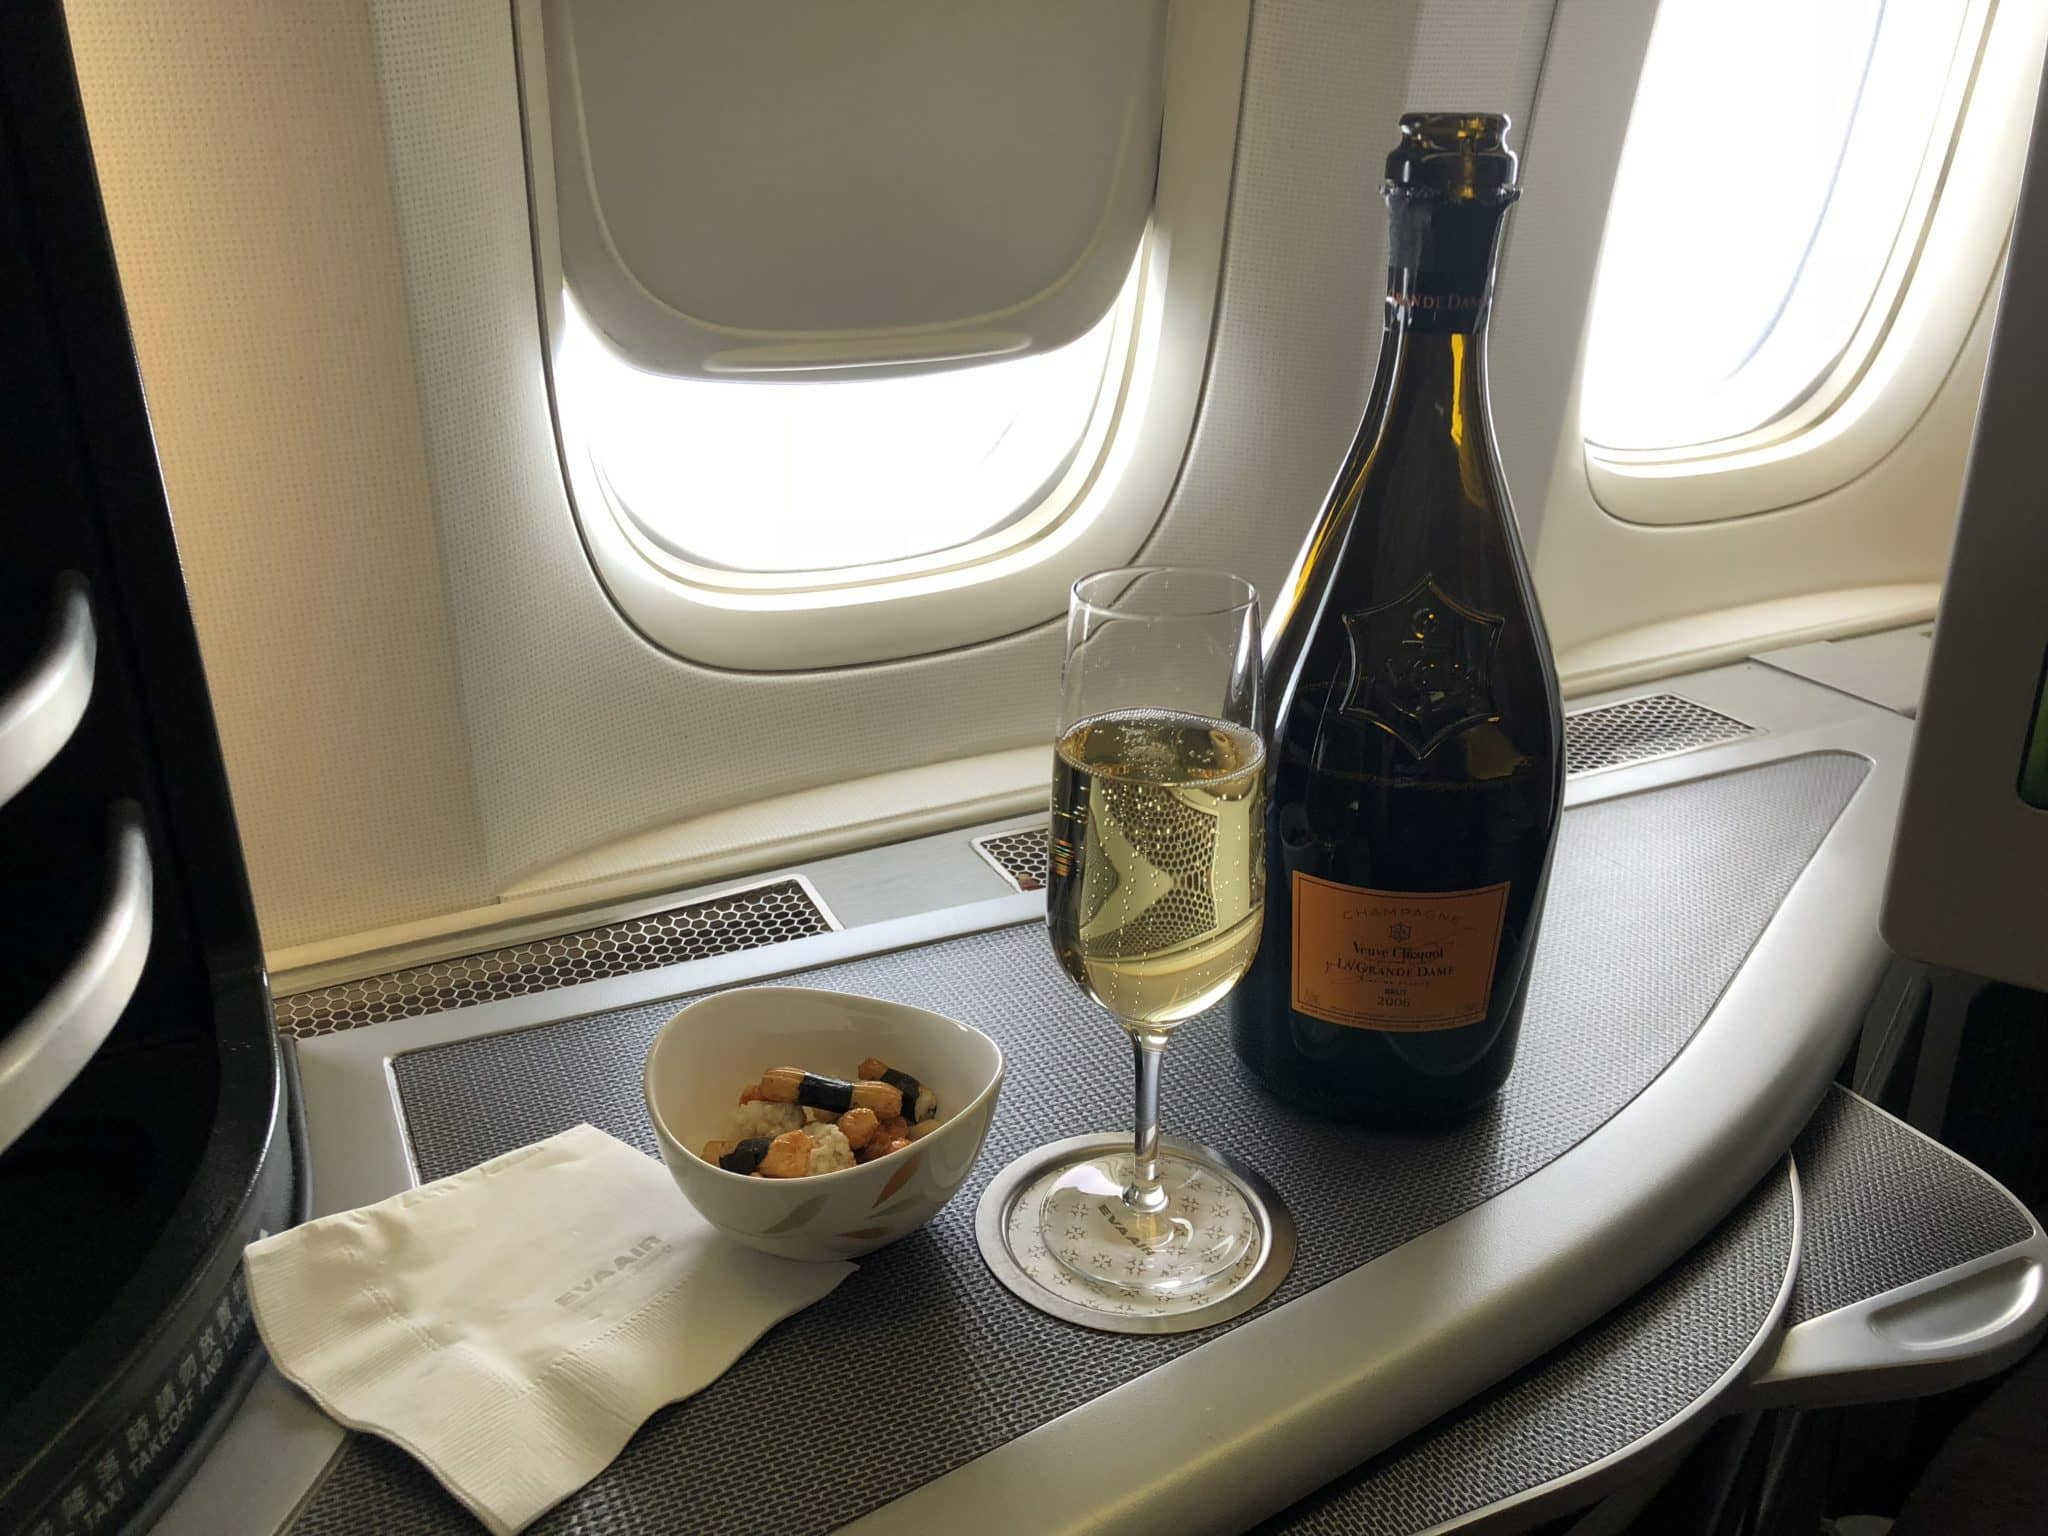 EVA Air Business Class Boeing 777-300 Champagner und Snacks